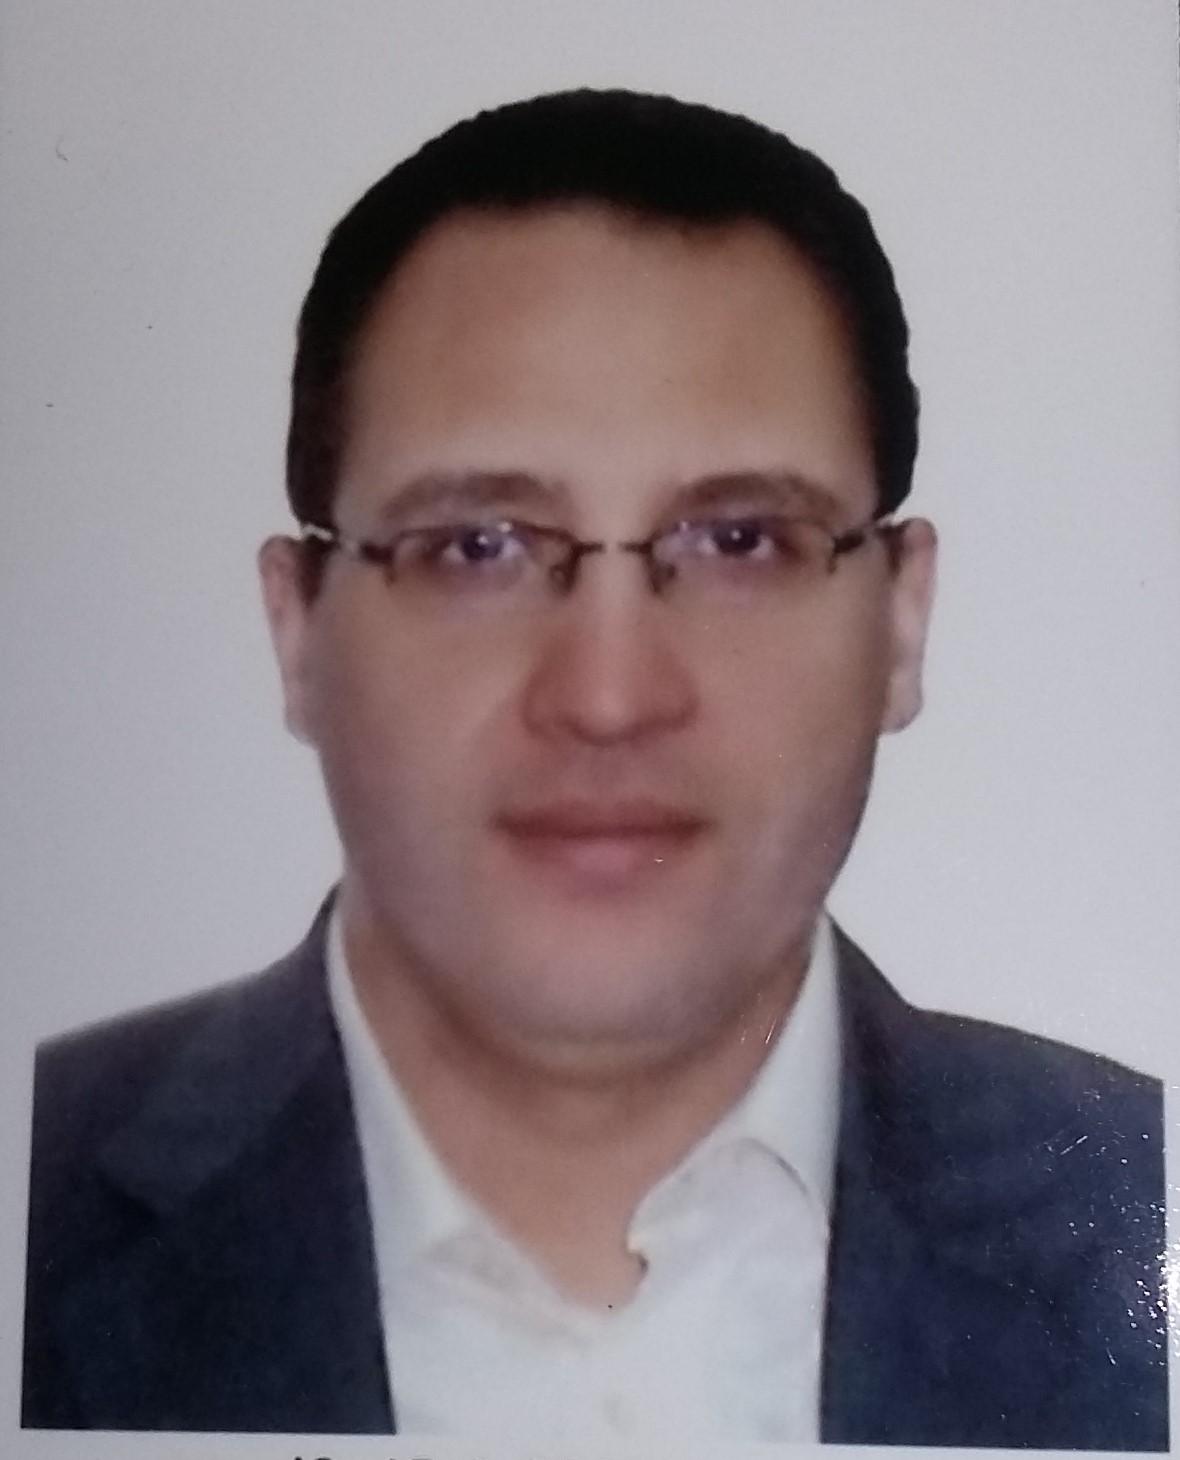 Atef A. Hassan